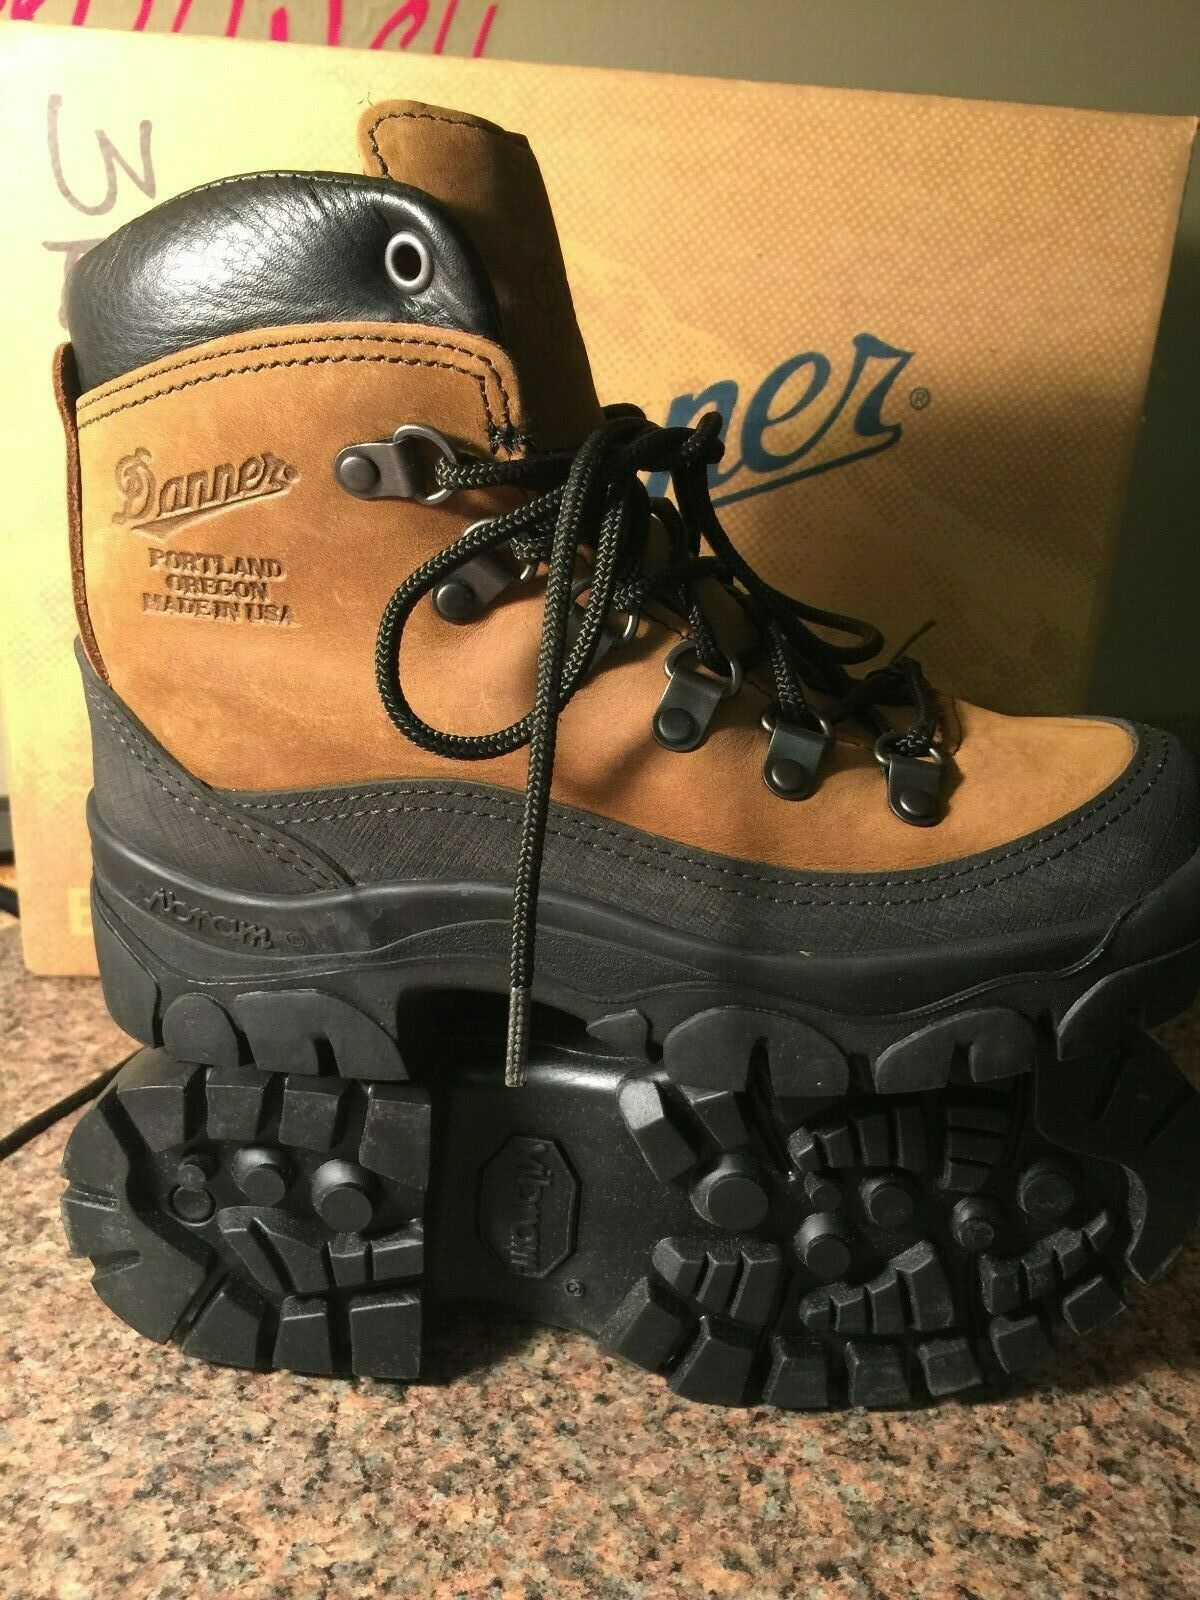 New Danners Mountain Combat Hiking stivali  Dimensione 3R